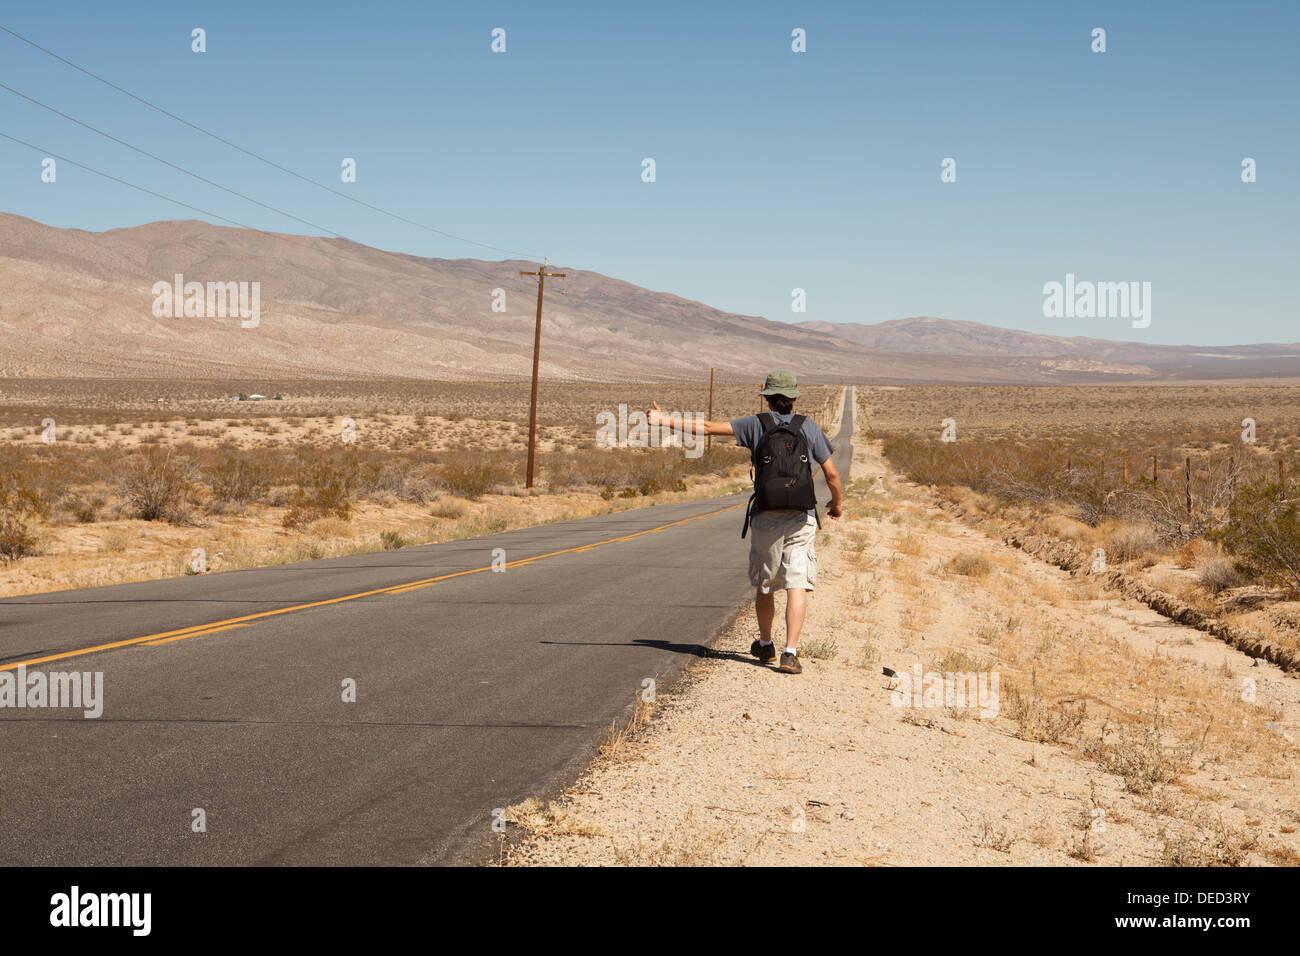 Man hitchhiking on a rural desert road - California USA Stock Photo